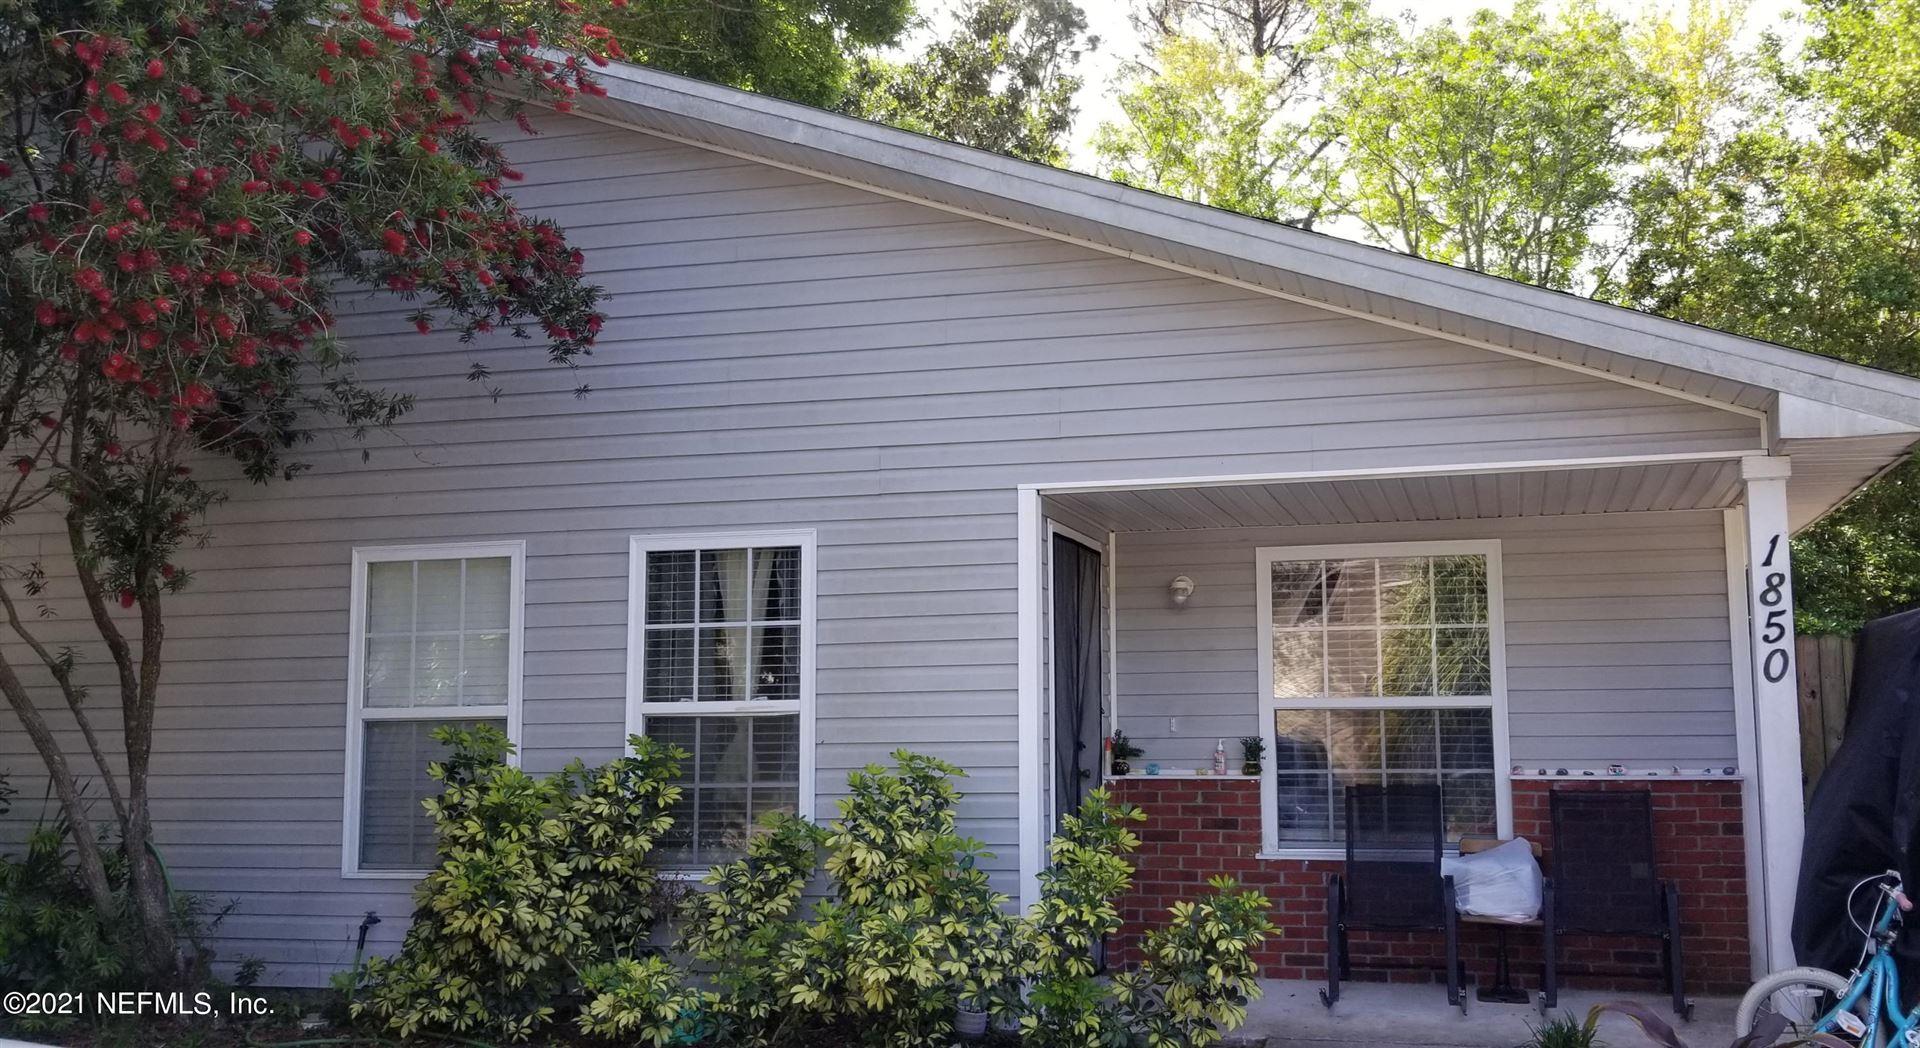 1850 FORSYTH CT, Jacksonville, FL 32233 - MLS#: 1108498